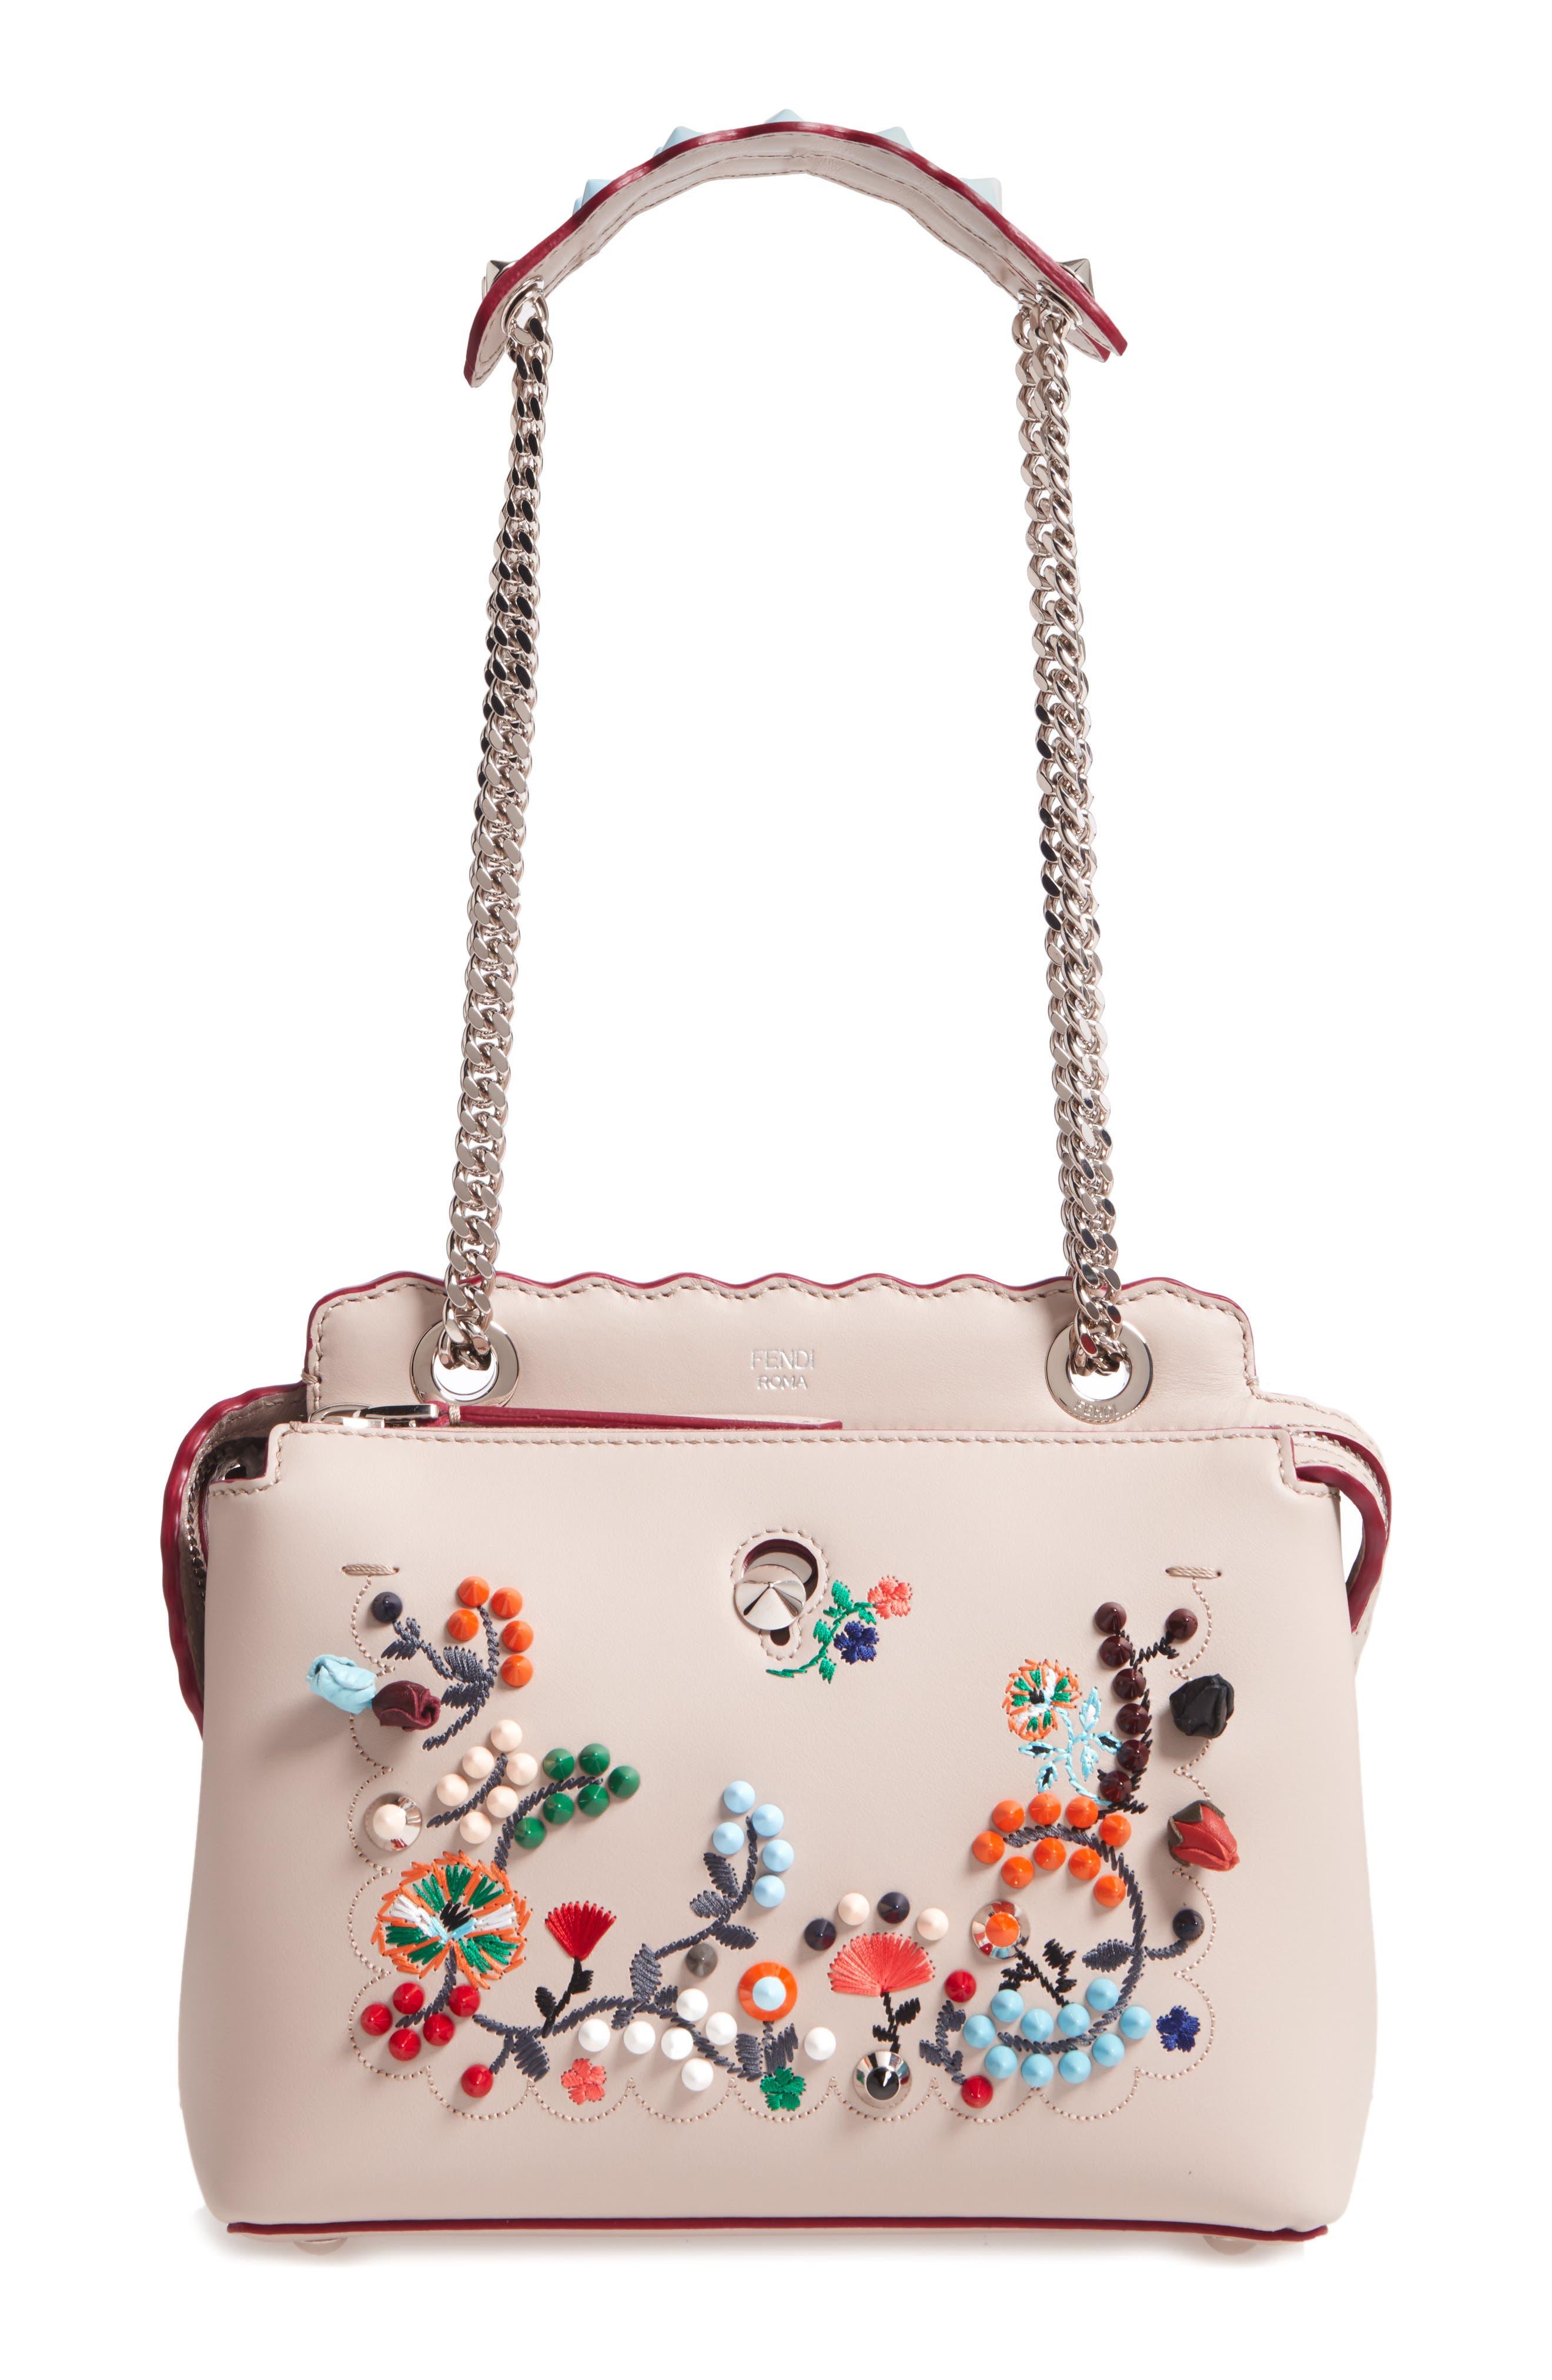 Main Image - Fendi Small Dotcom Leather Shoulder Bag